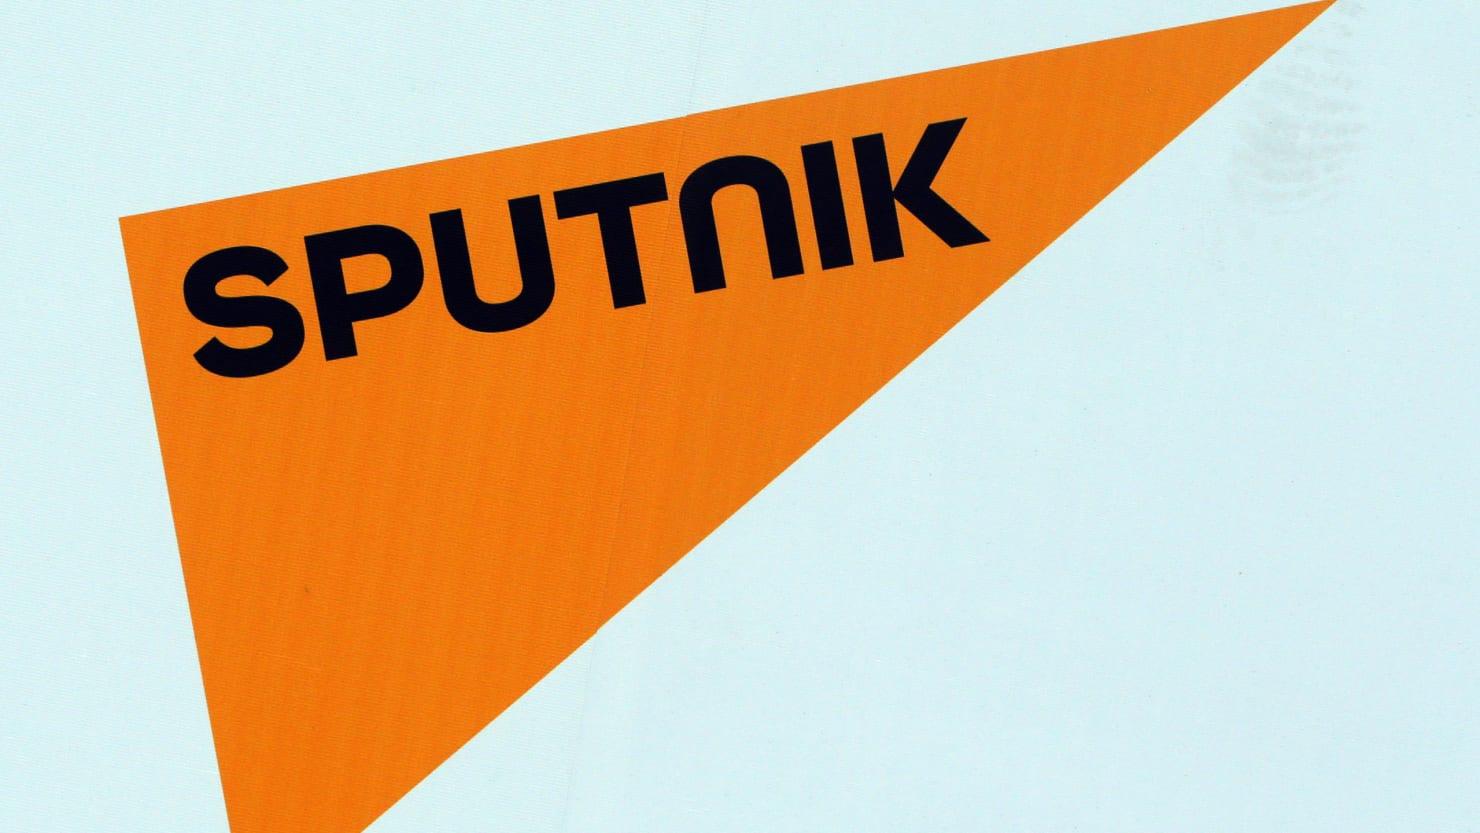 The logo of Russian state news agency Sputnik is seen on a board at the St. Petersburg International Economic Forum 2017 (SPIEF 2017) in St. Petersburg, Russia, June 1, 2017. Picture taken June 1, 2017. REUTERS/Sergei Karpukhin - RC17834DEB30